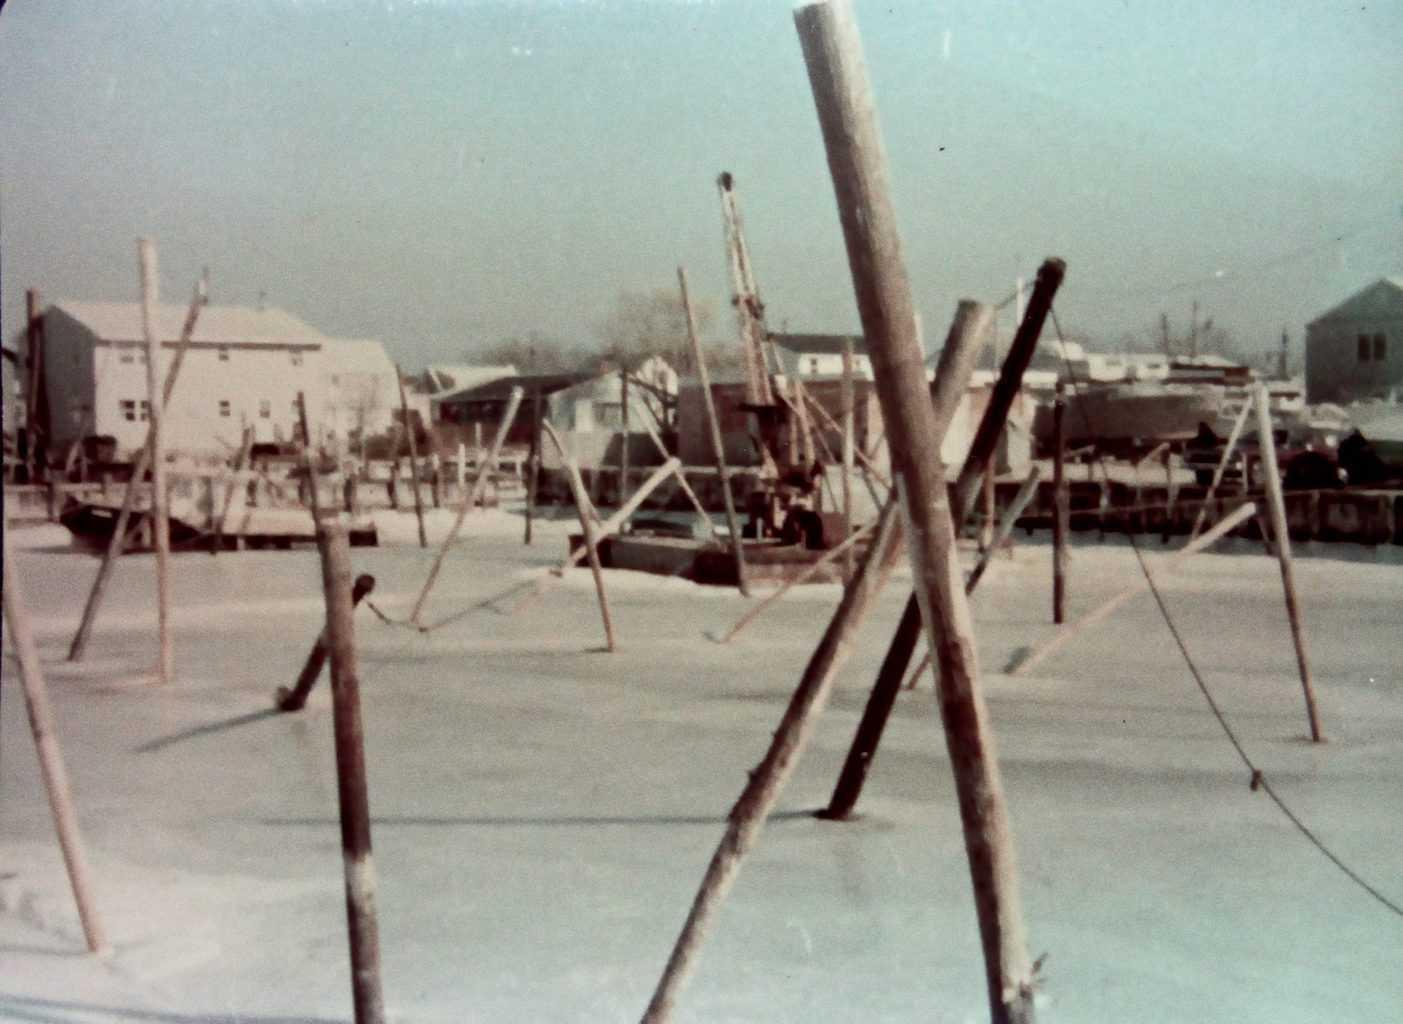 Marina Ice Damage 1970's - Stilt's Marina in North Beach Haven NJ Long Beach Island